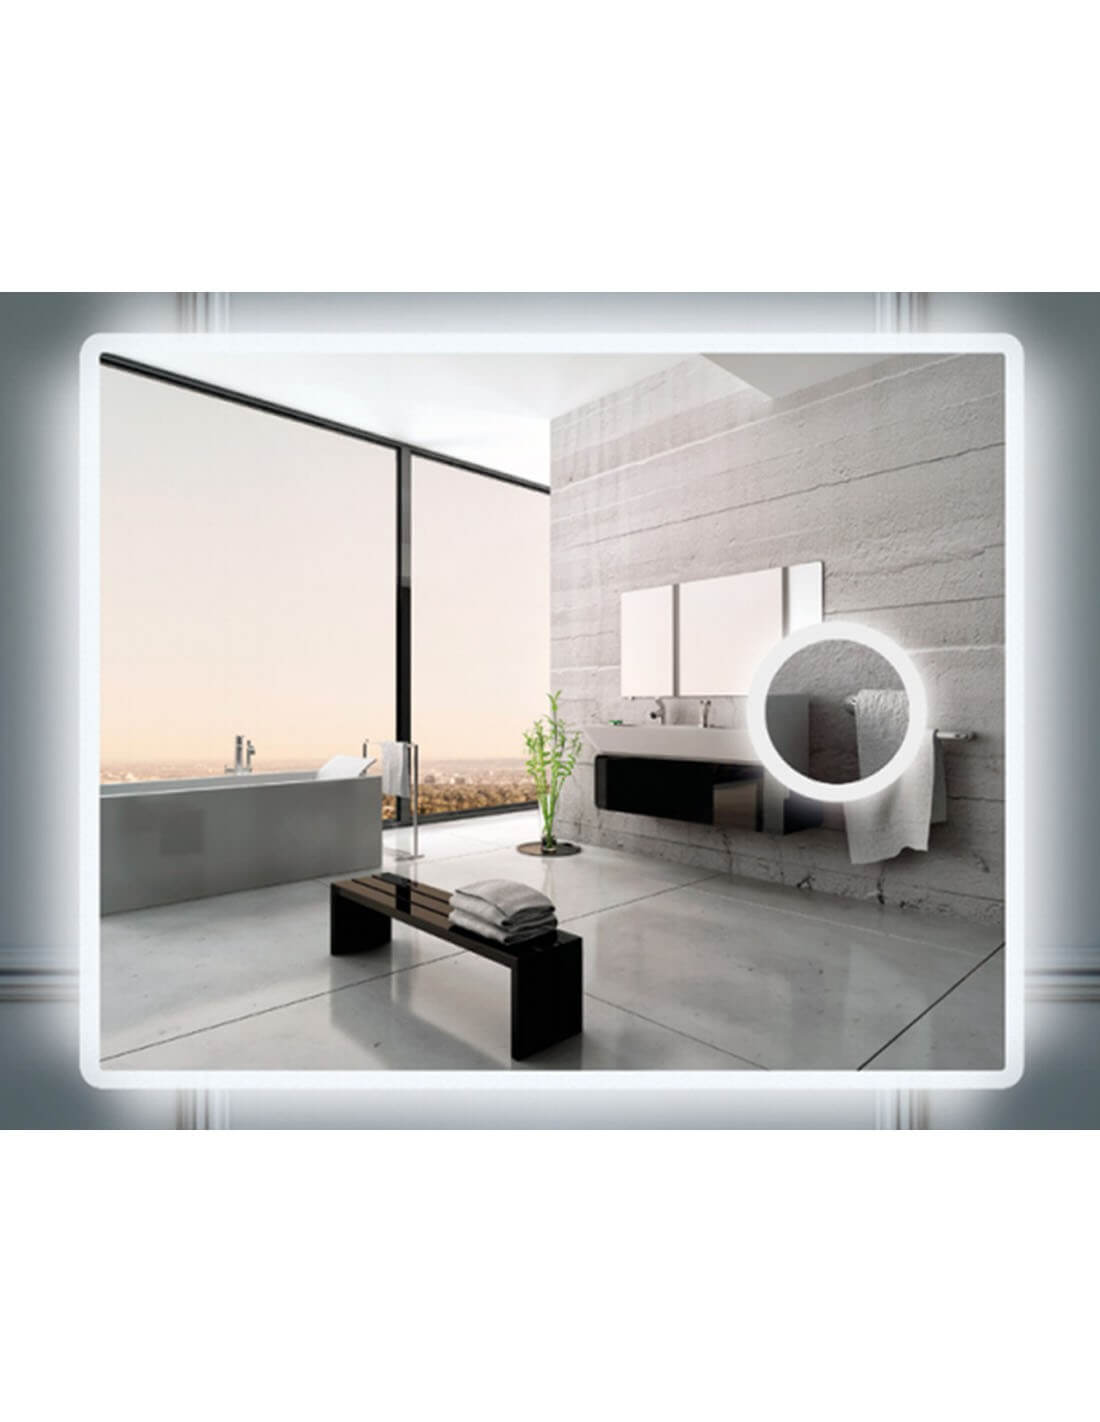 Espejo led rectangular con aumento de PyP